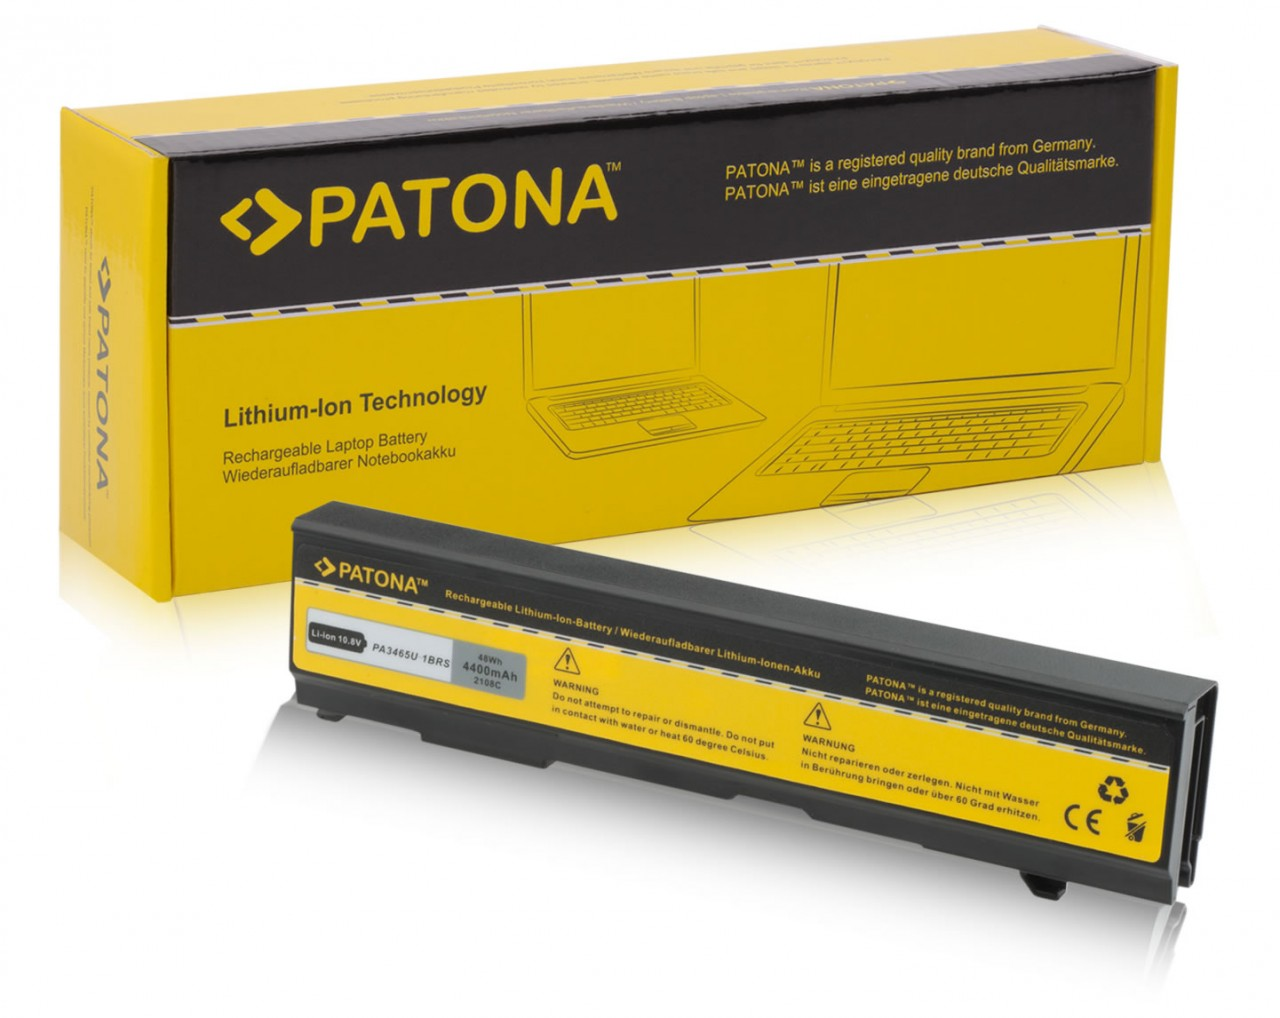 PATONA Battery f. Toshiba Dynabook AX/55A TW/750LS Equium A1